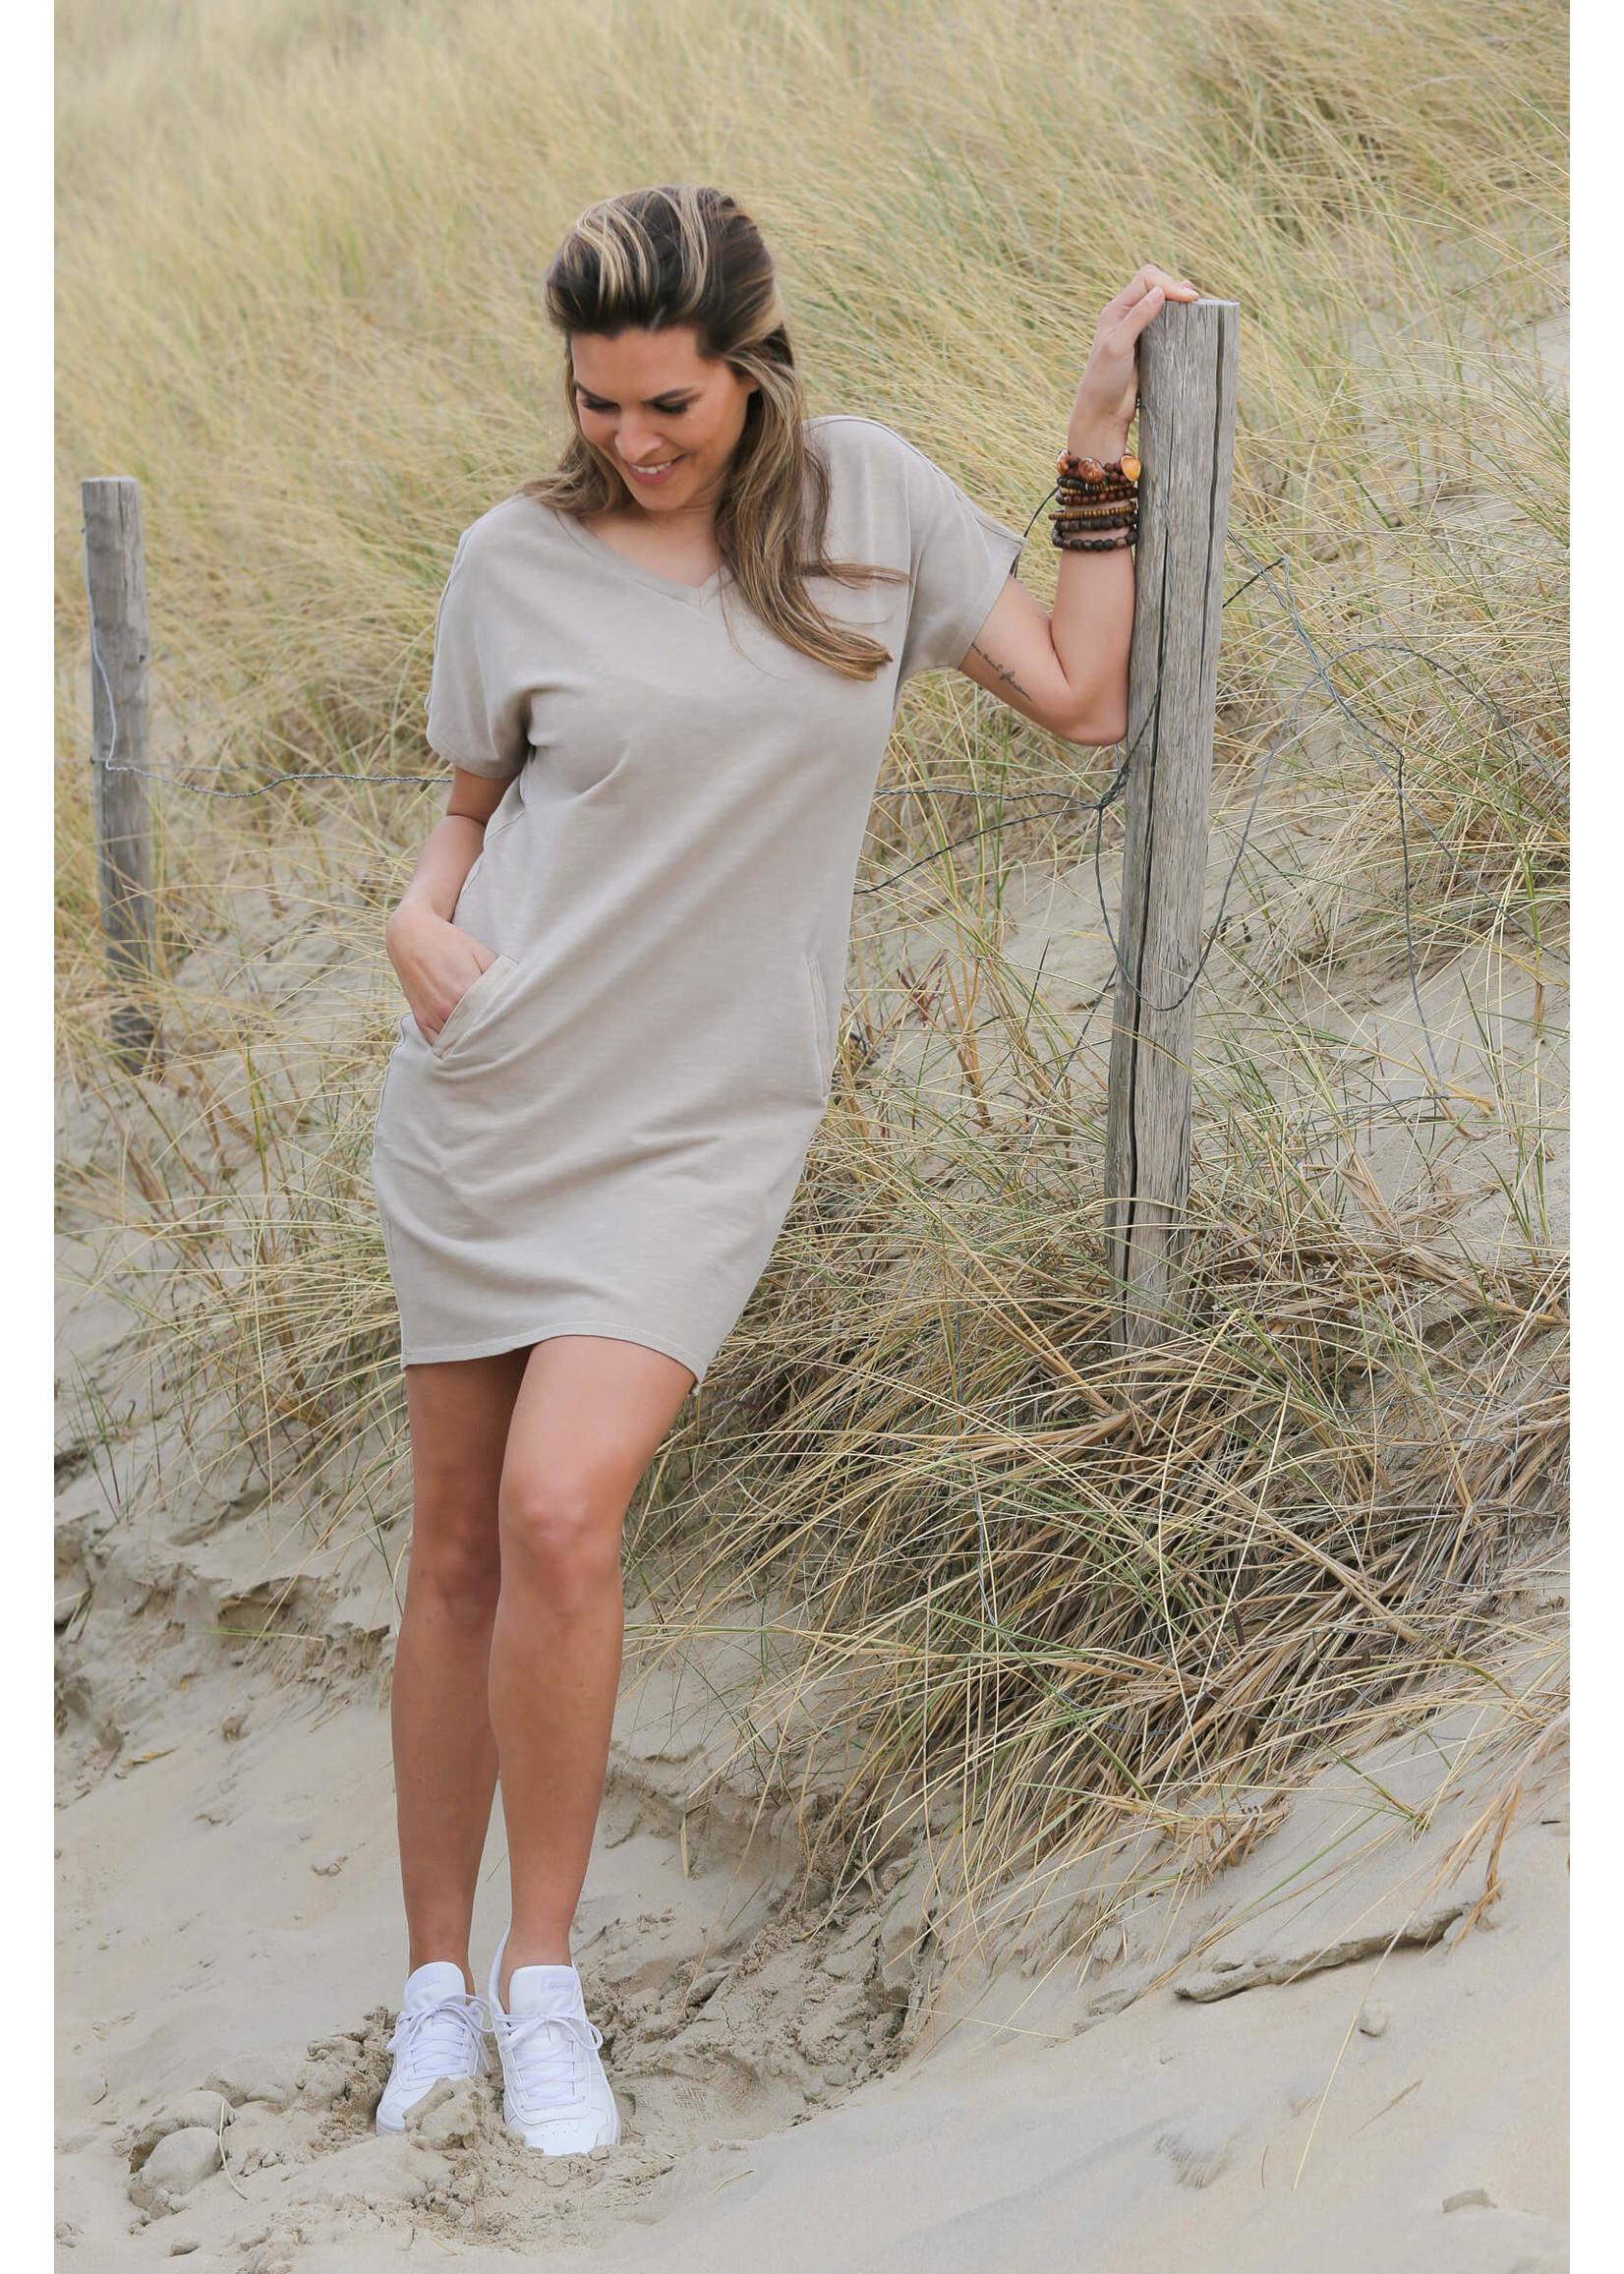 Zoso Summery Garment dye dress